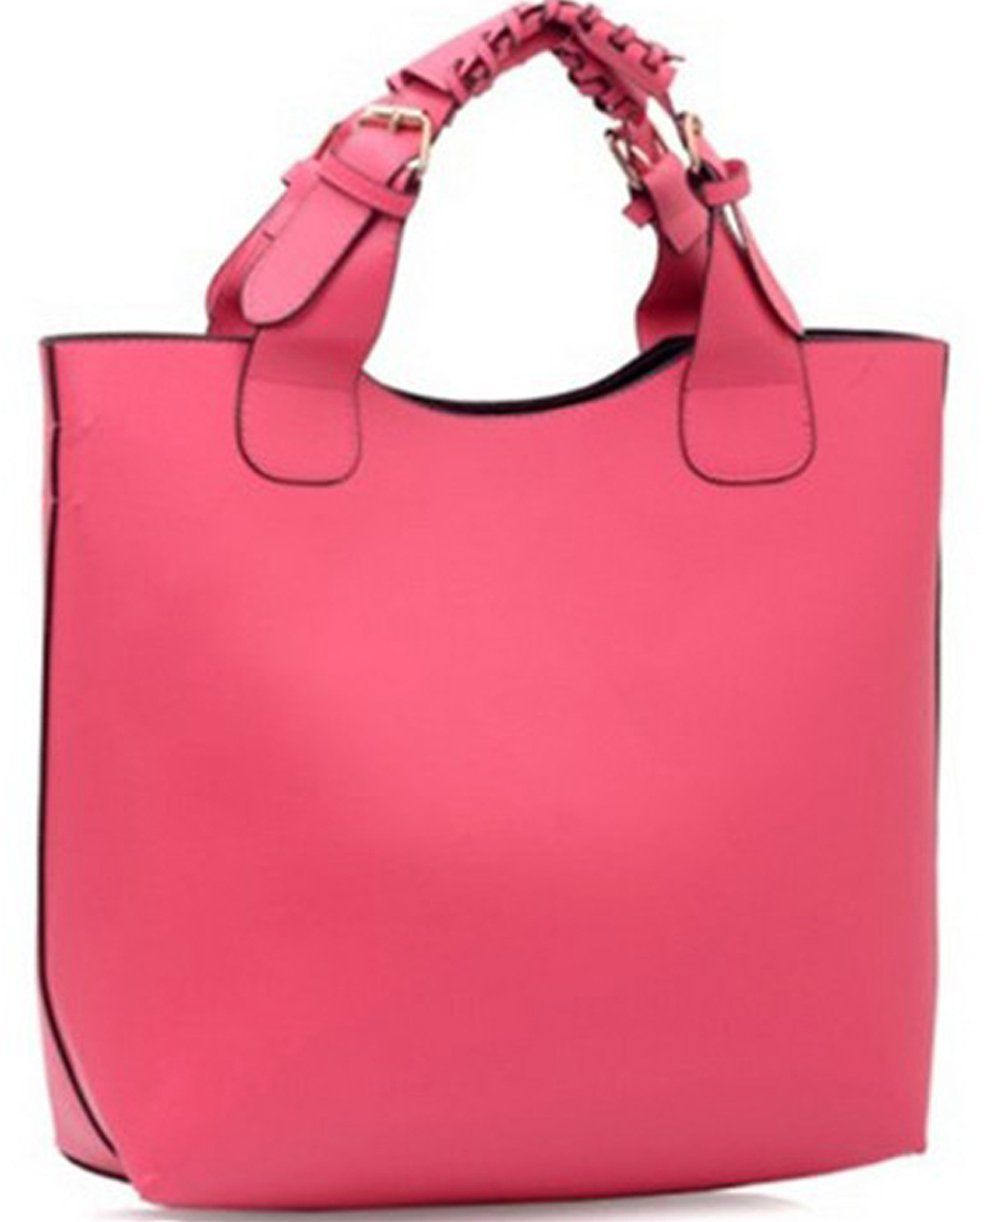 Amazon.com: 2013 business casual bag retro handbags fashion handbags shoulder bag wild (brown): Clothing